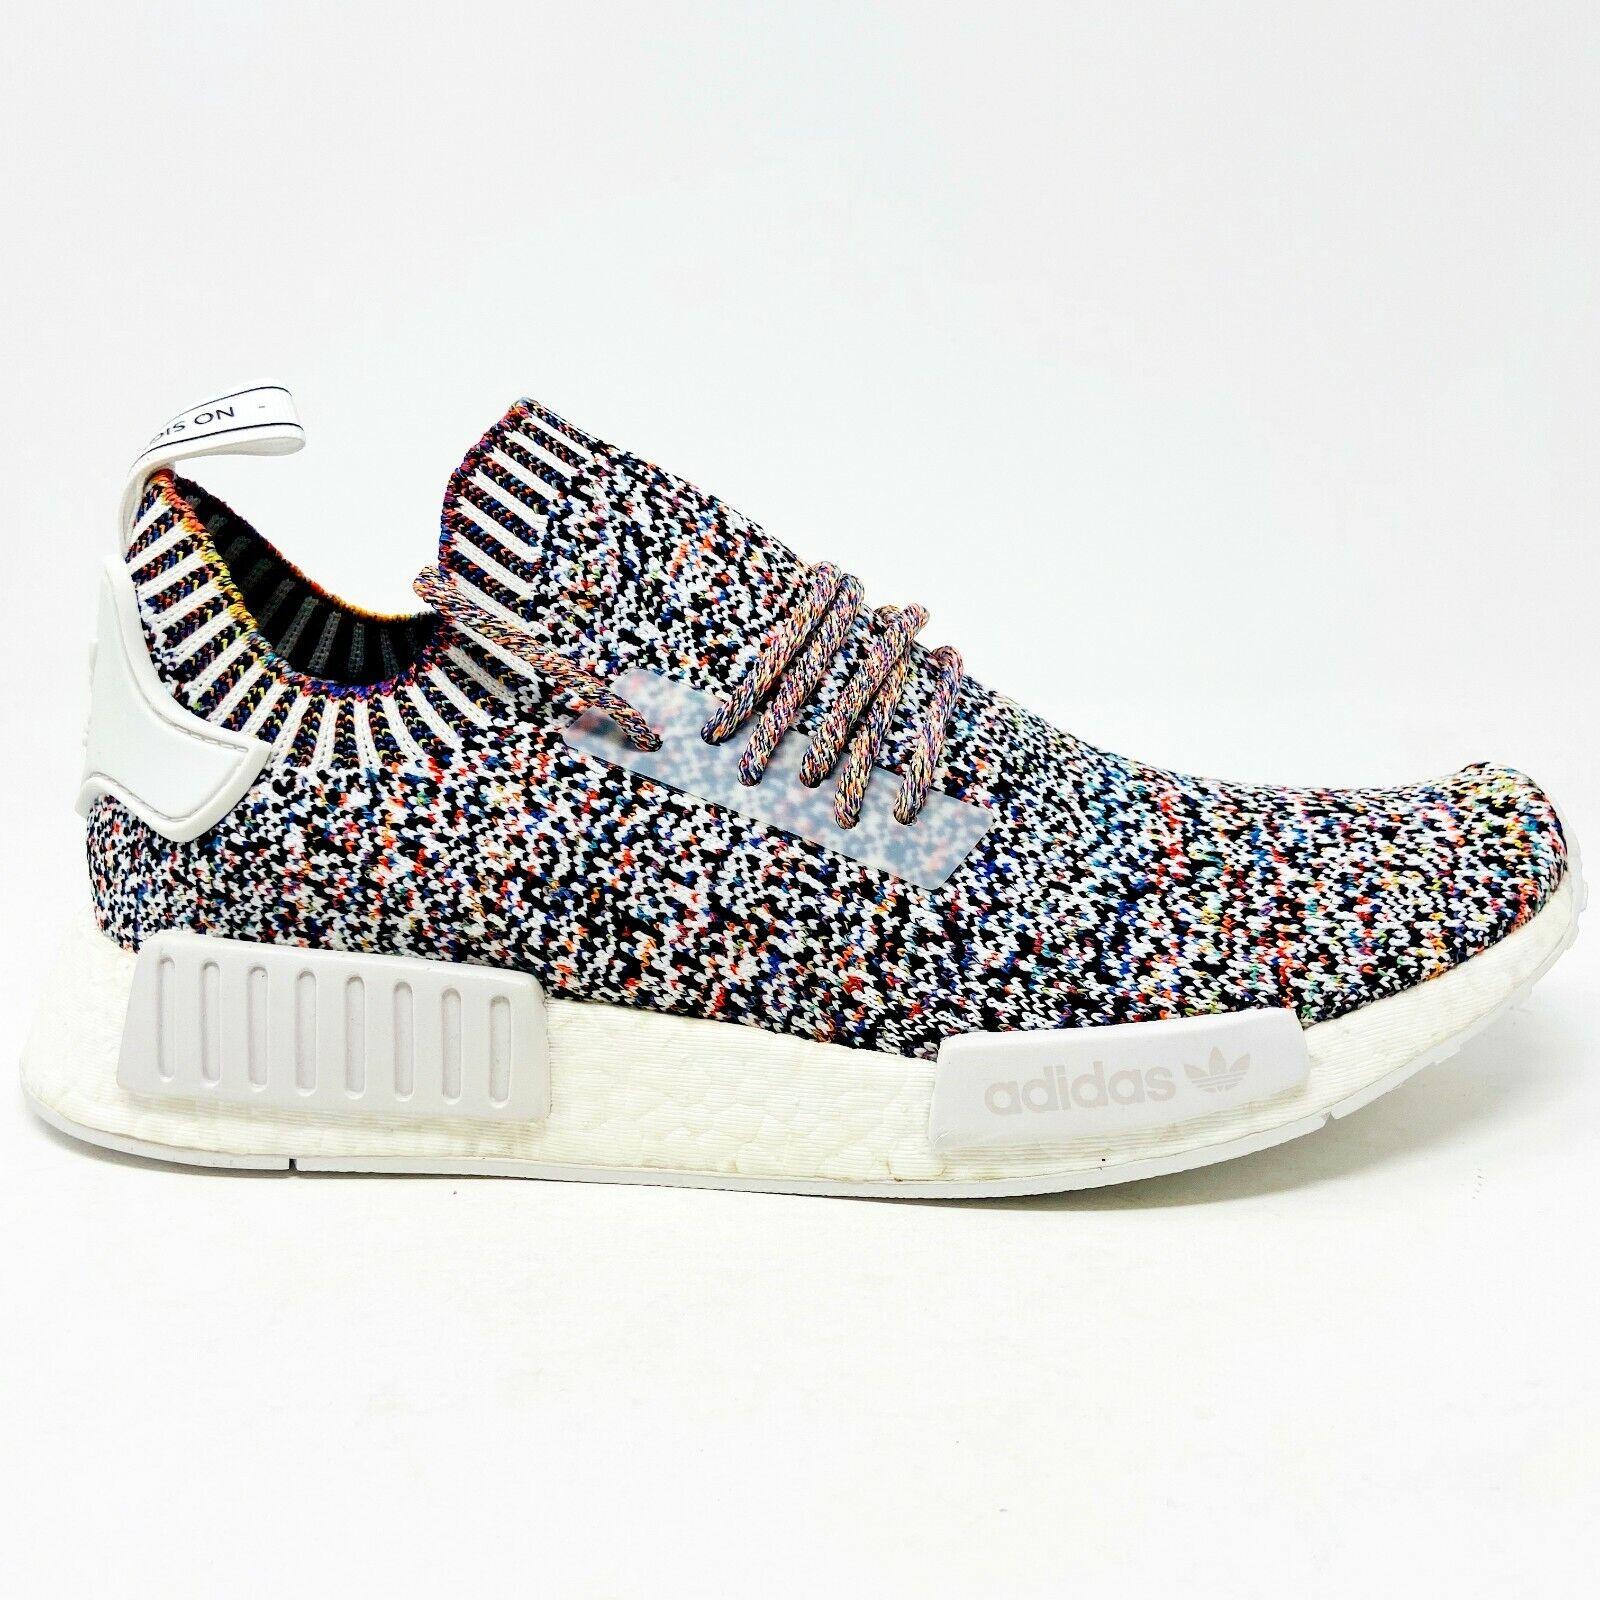 adidas nmd r1 colour static rainbow